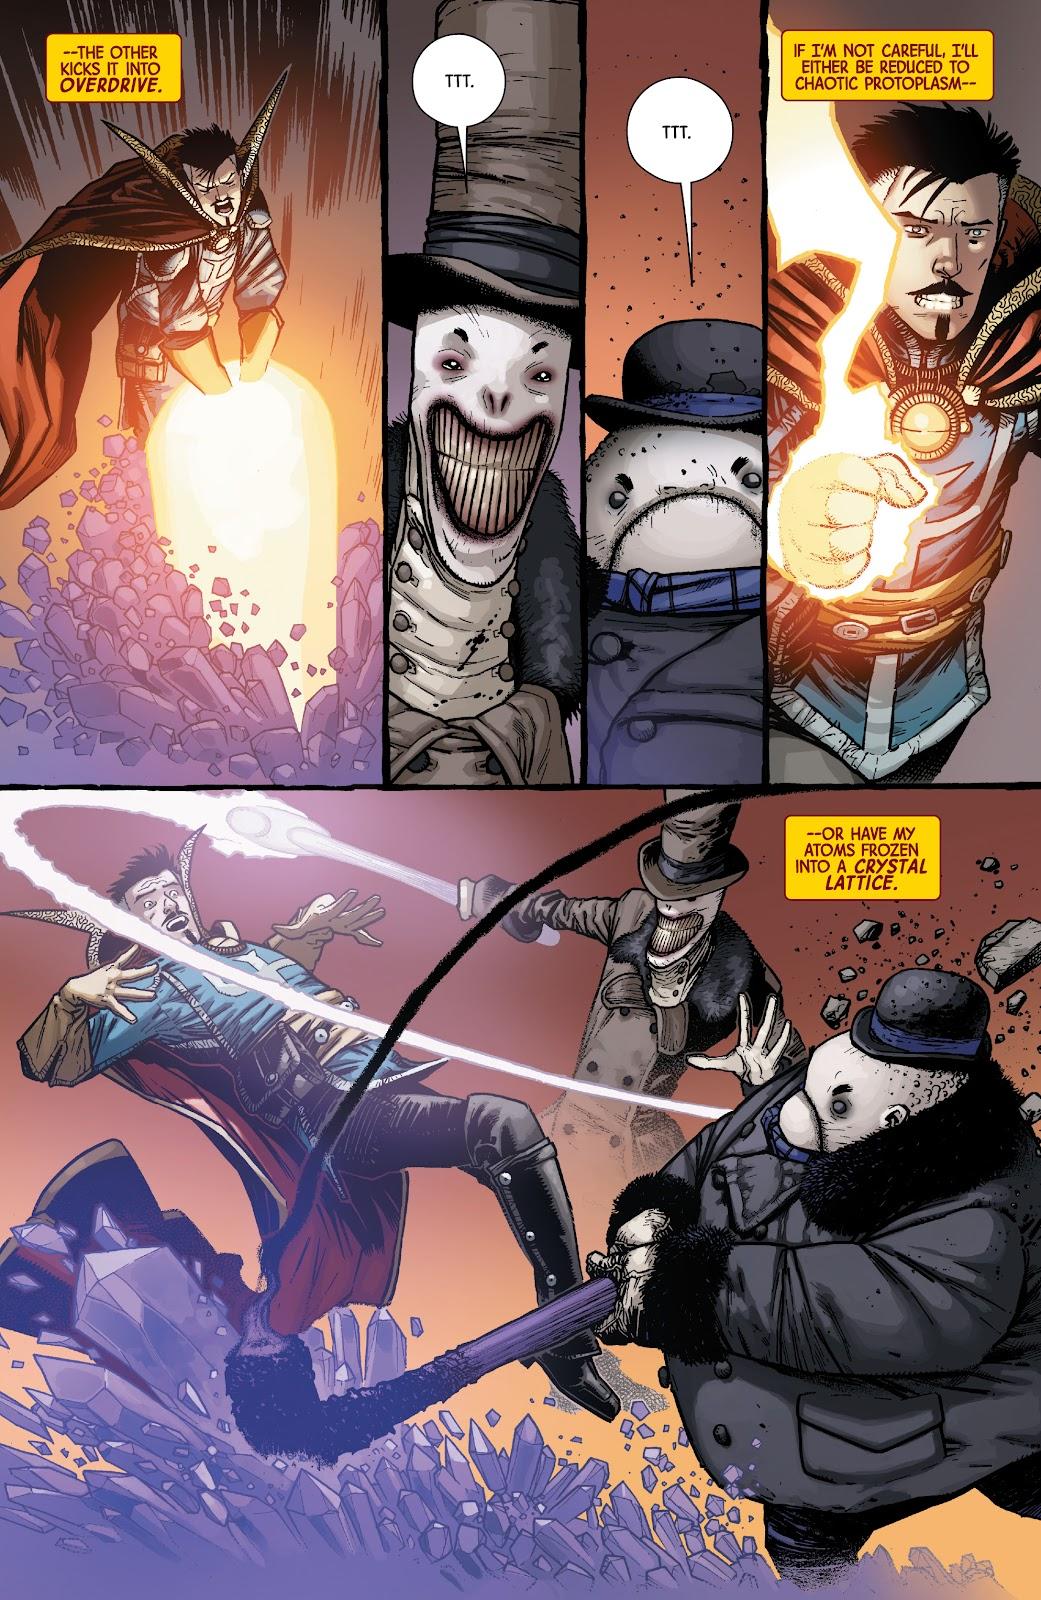 Read online Dr. Strange comic -  Issue #5 - 4